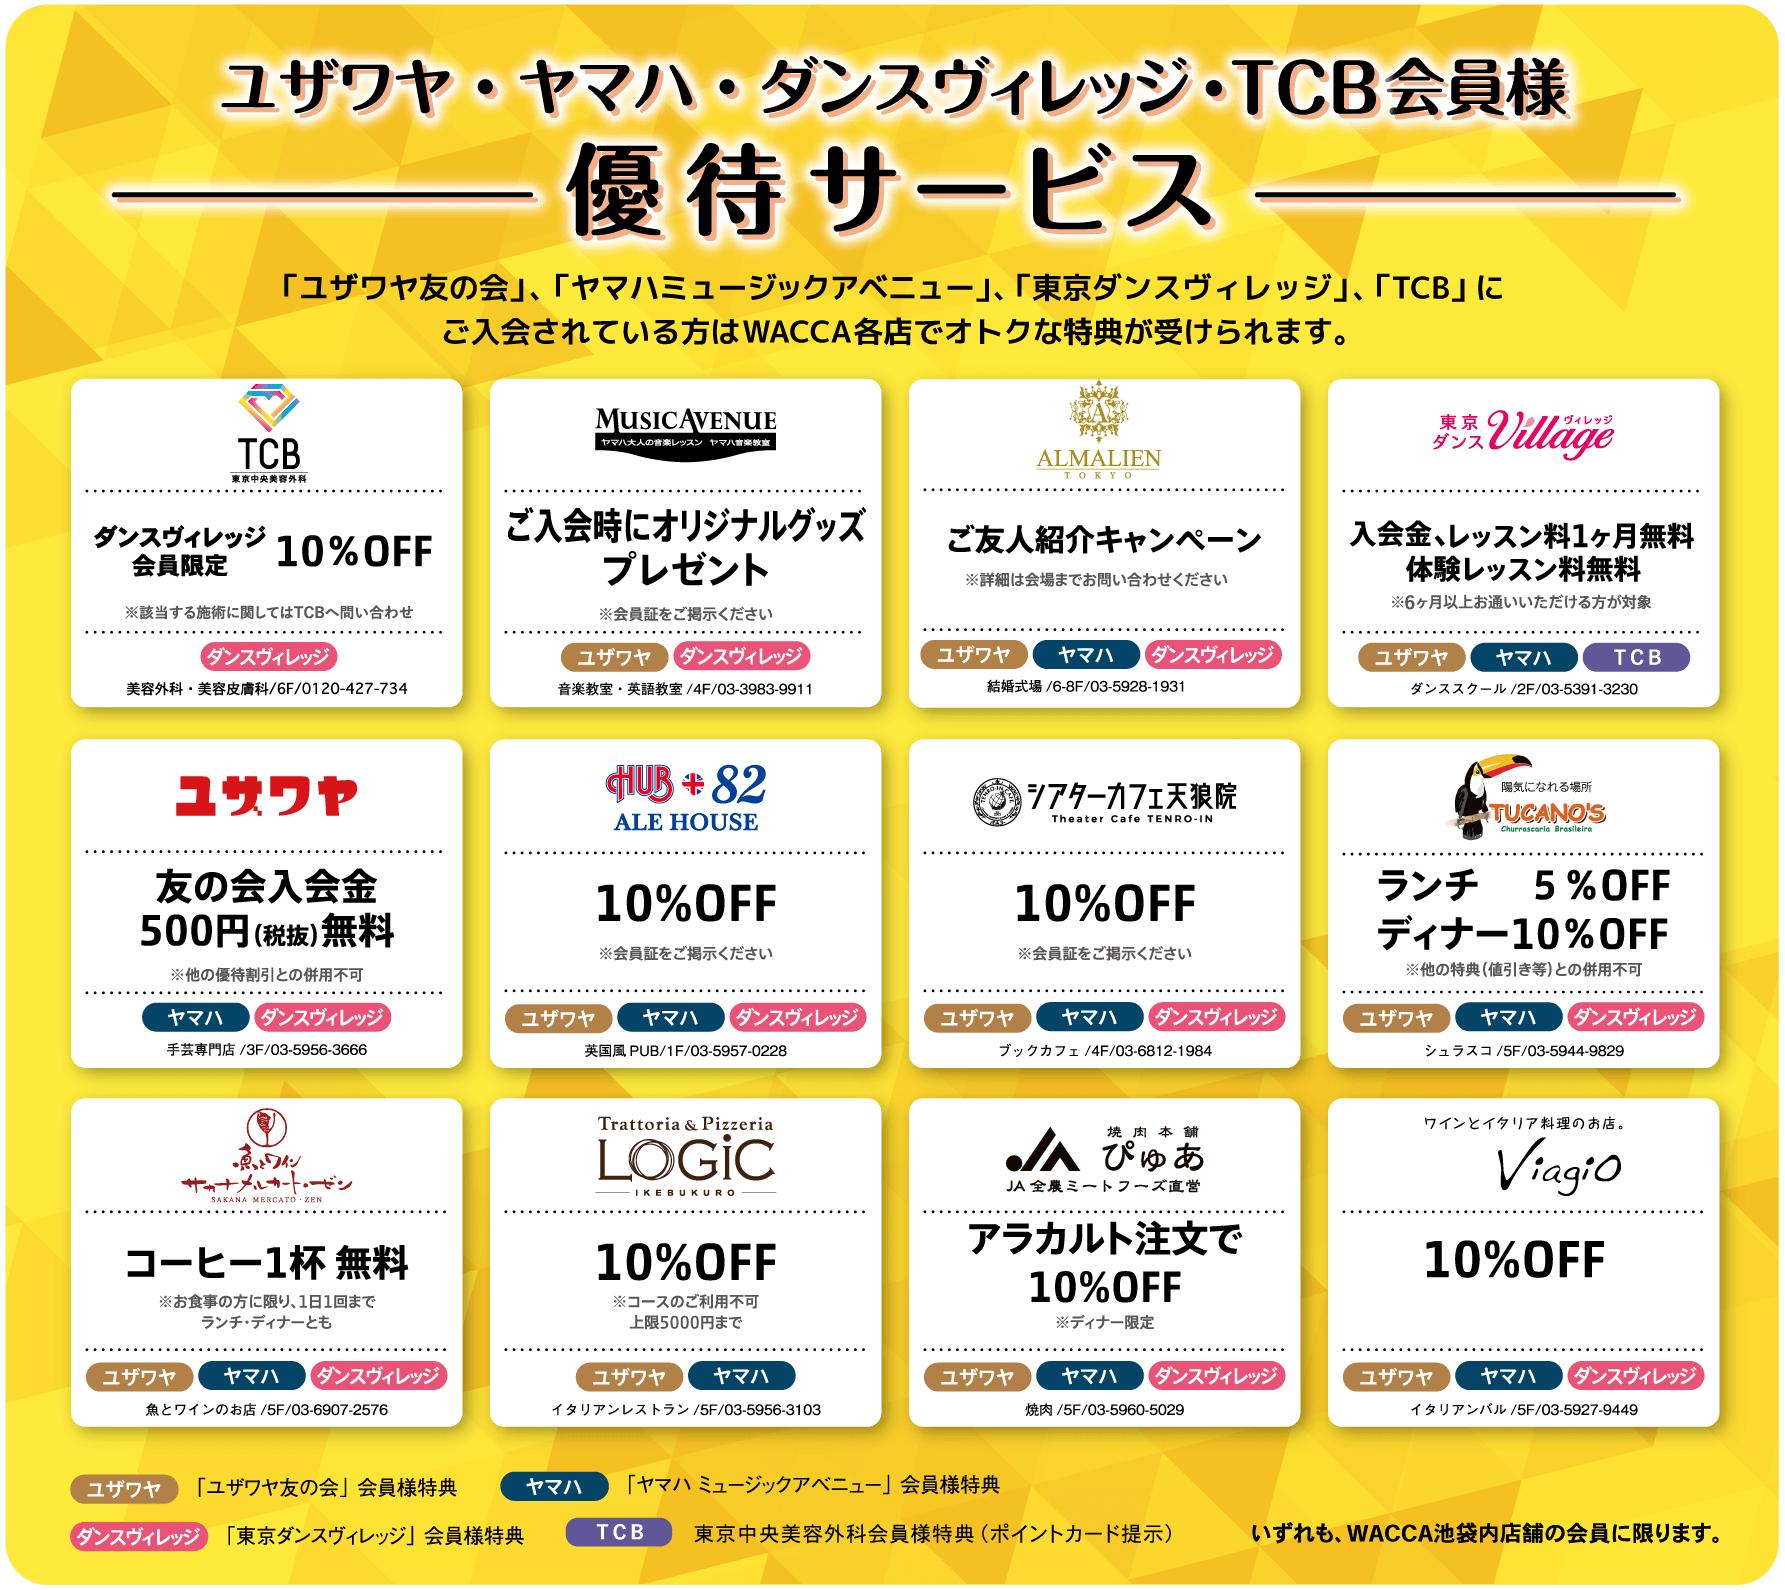 WACCA池袋 「ユザワヤ友の会」「ヤマハミュージックアベニュー」「東京ダンスヴィレッジ」「TCB」会員様 優待サービス